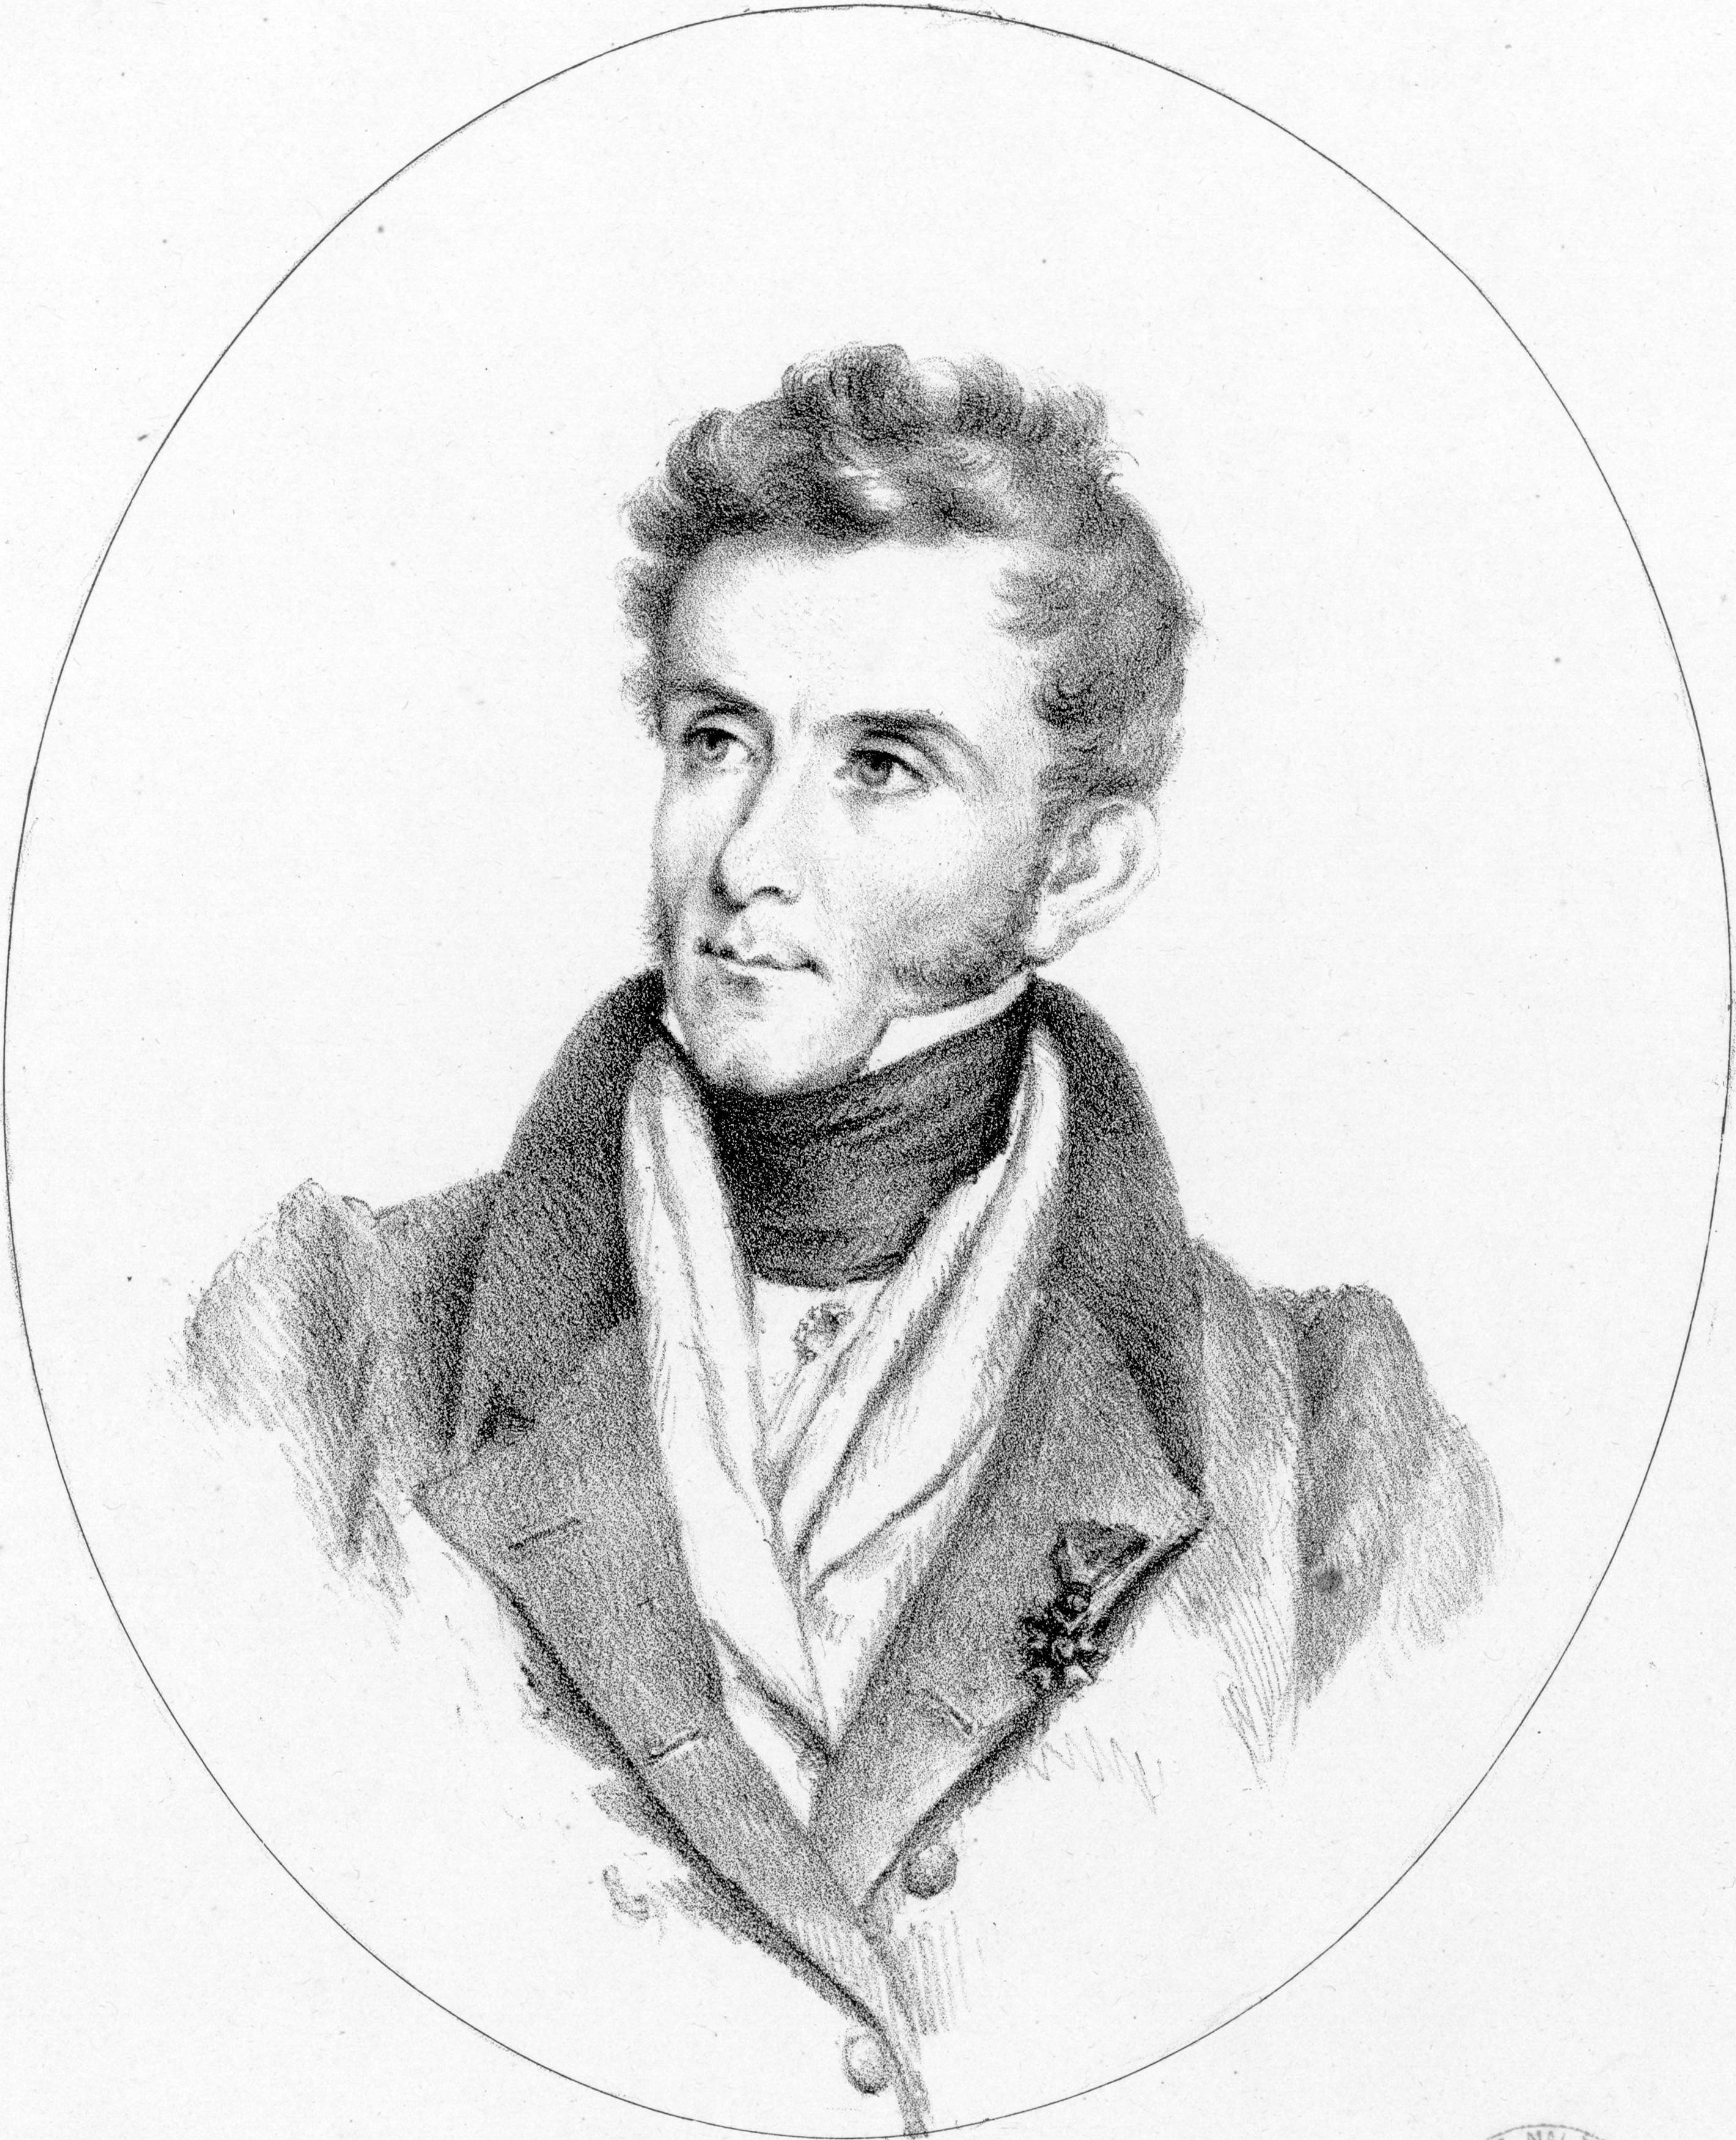 Felice Blangini